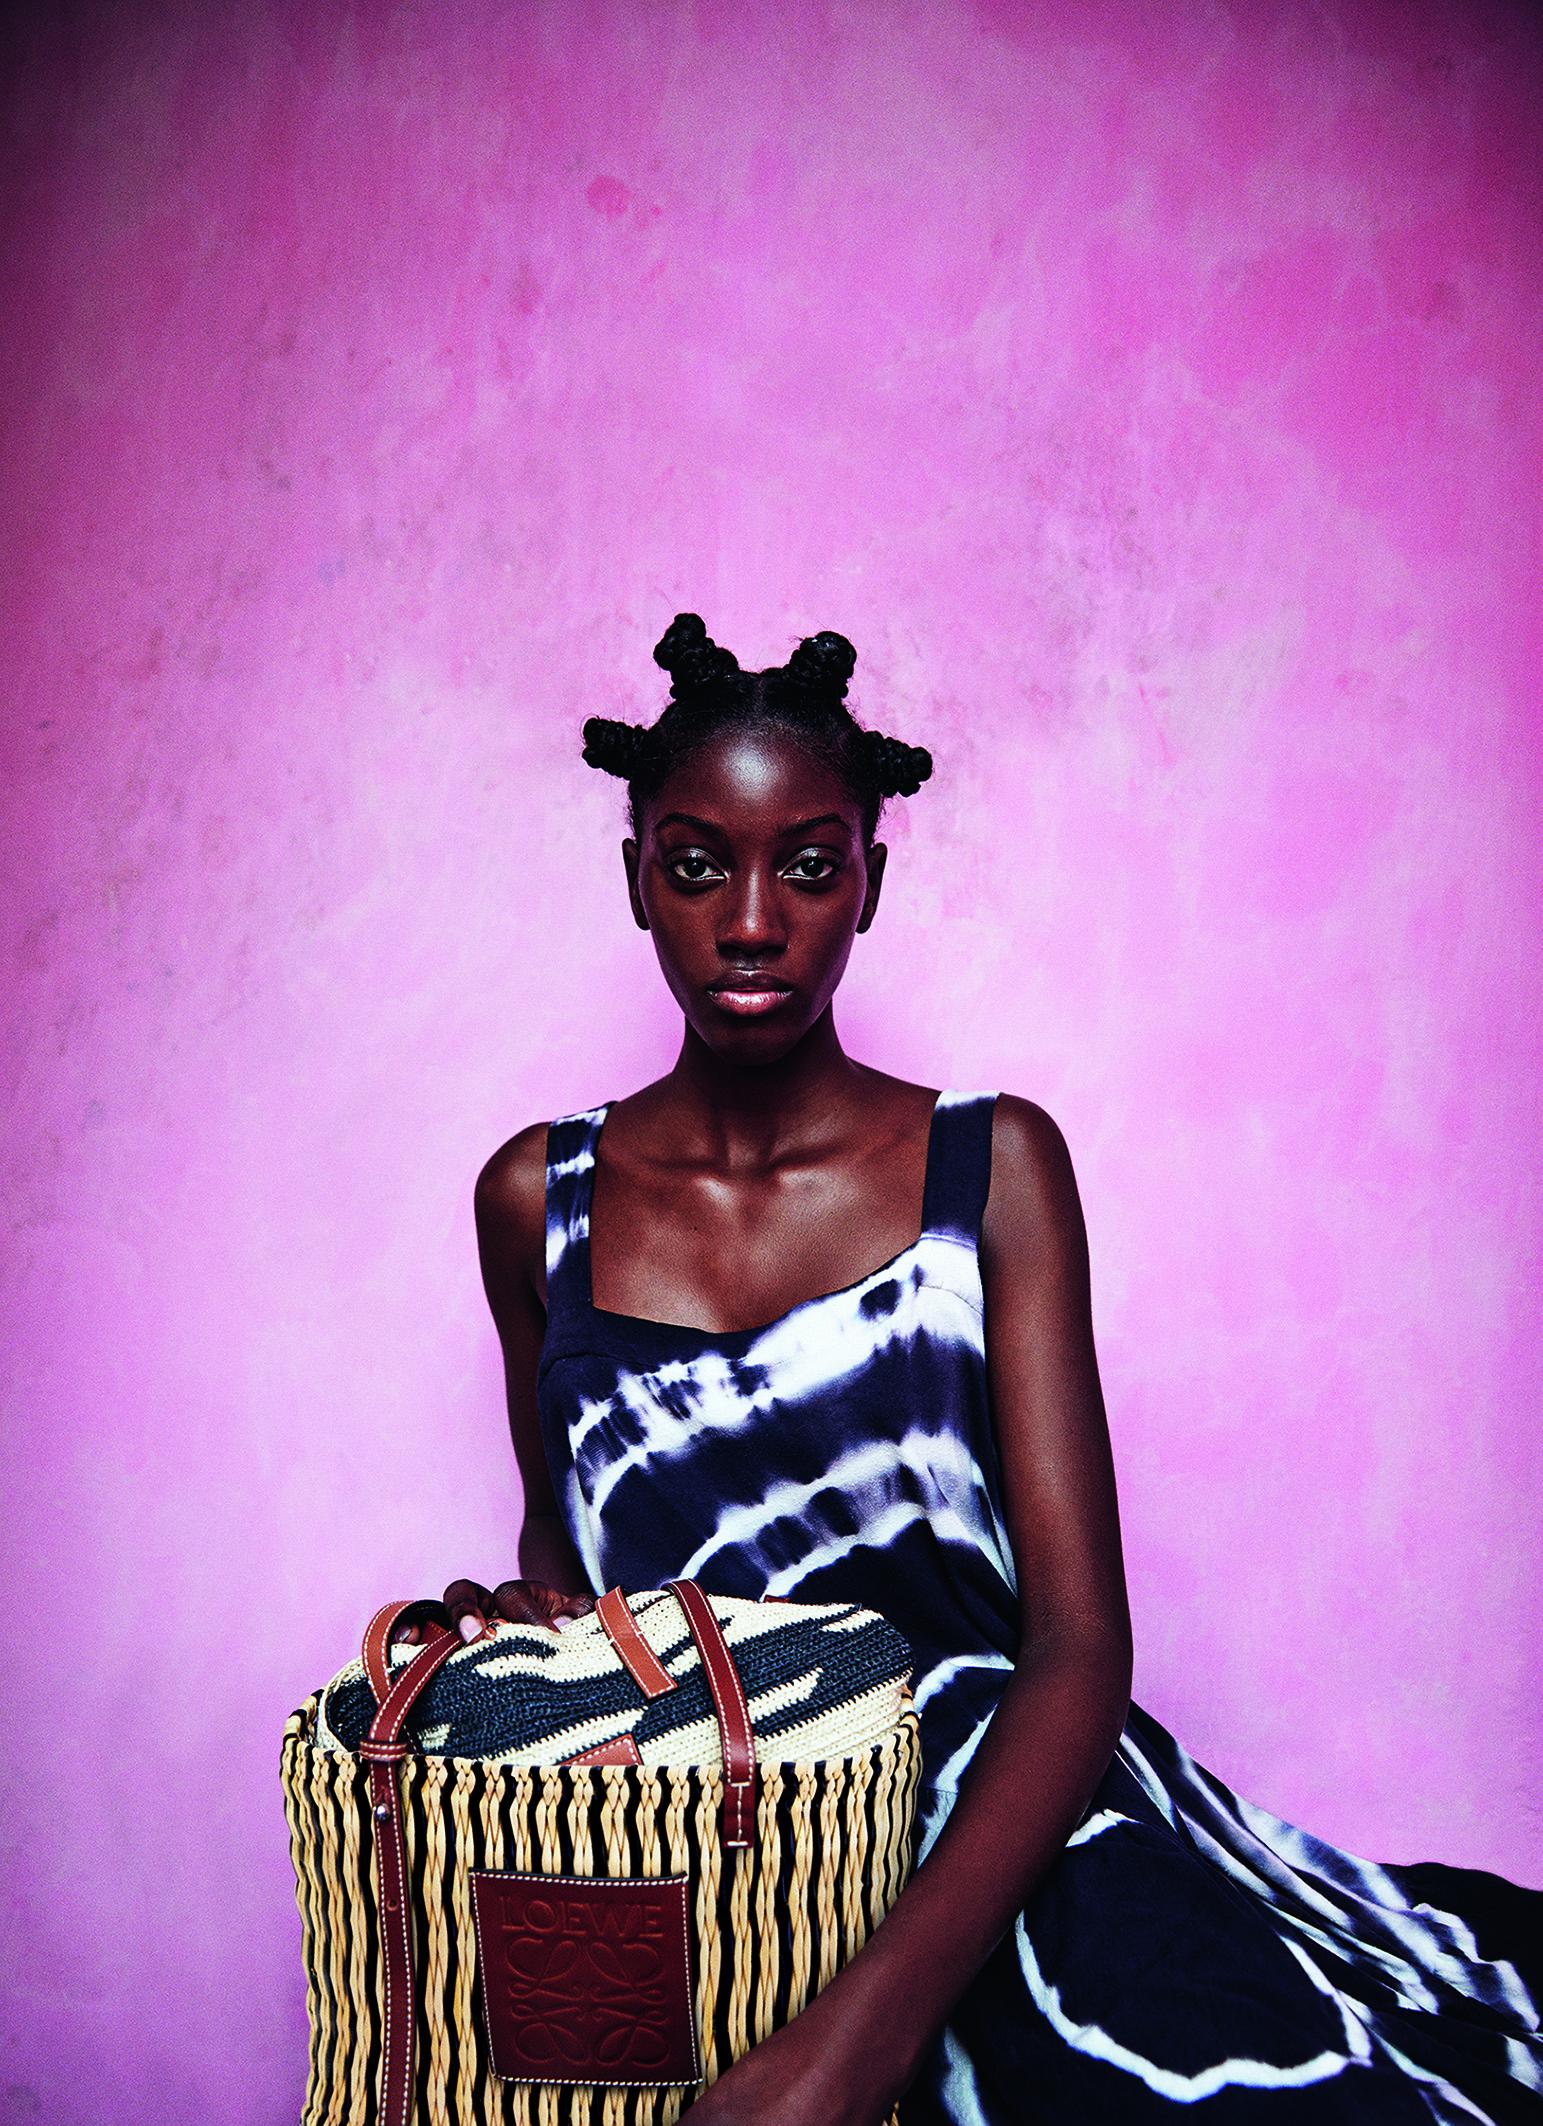 Loewe Paula's Ibiza Spring 2020 Fashion Ad Campaign Photos